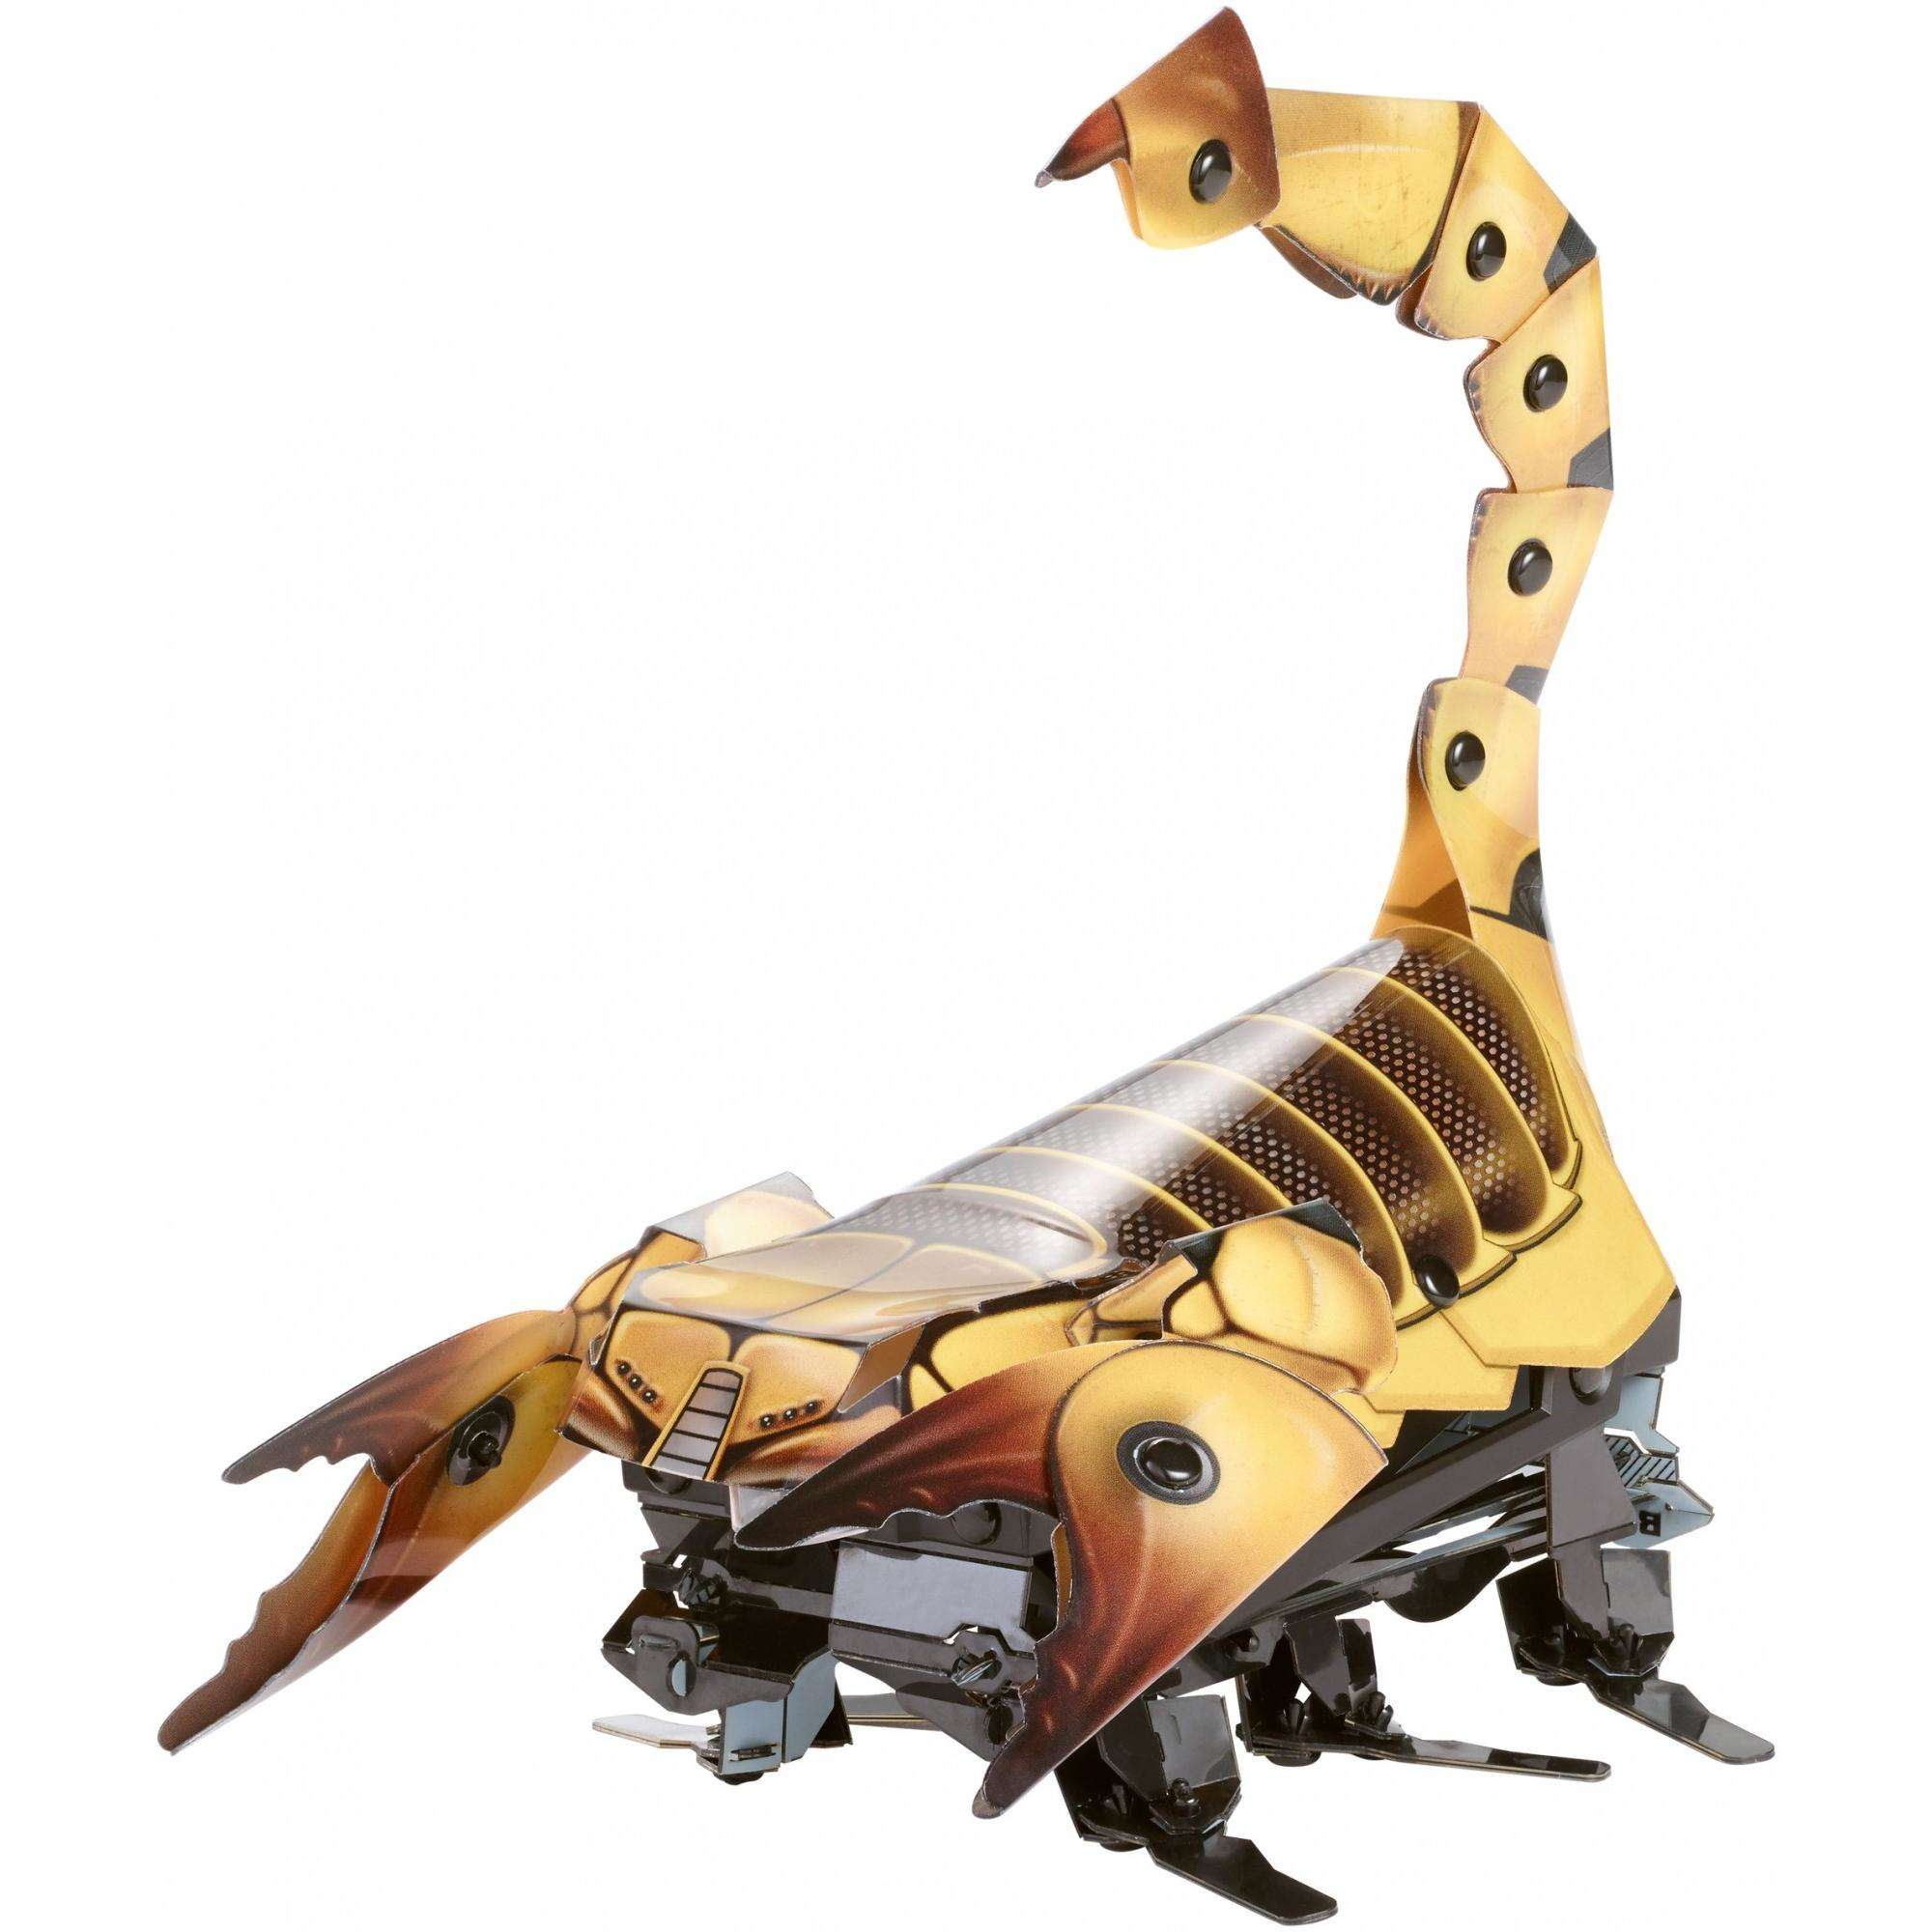 Kamigami Scarrax Battle Robot, Engineering Build Program Play